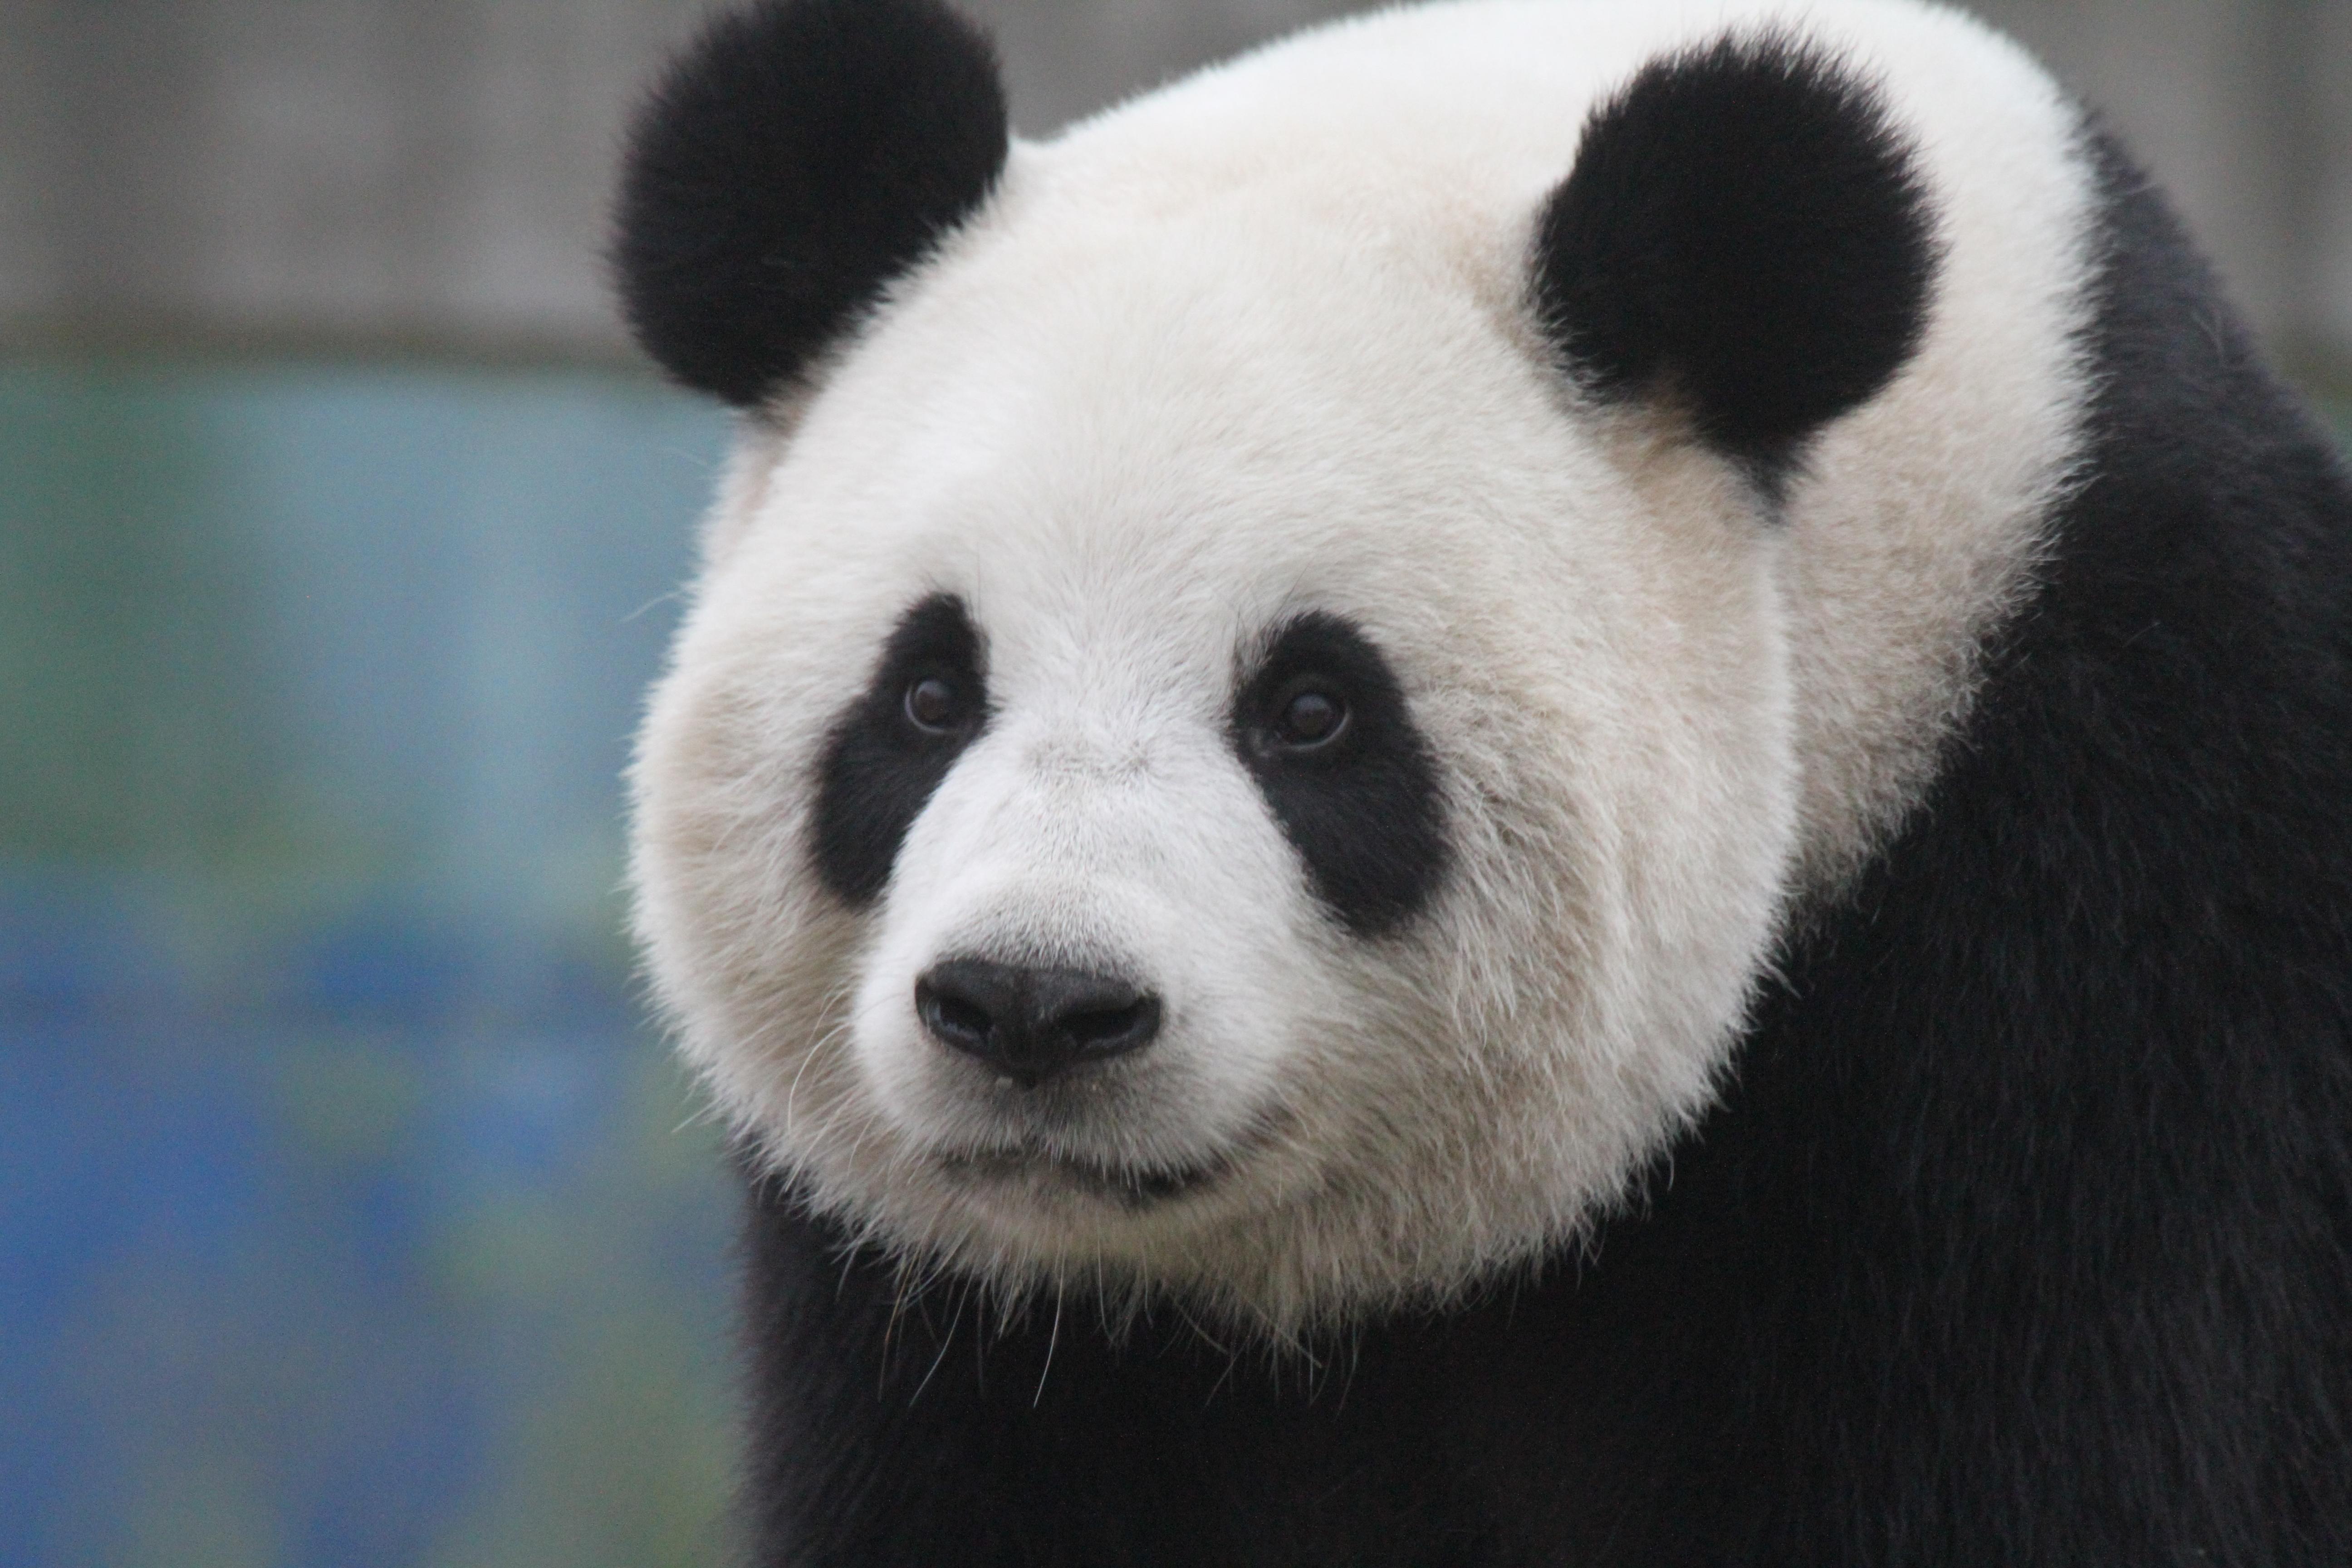 Giant Pandas A Beautiful Gift From China To Belgium